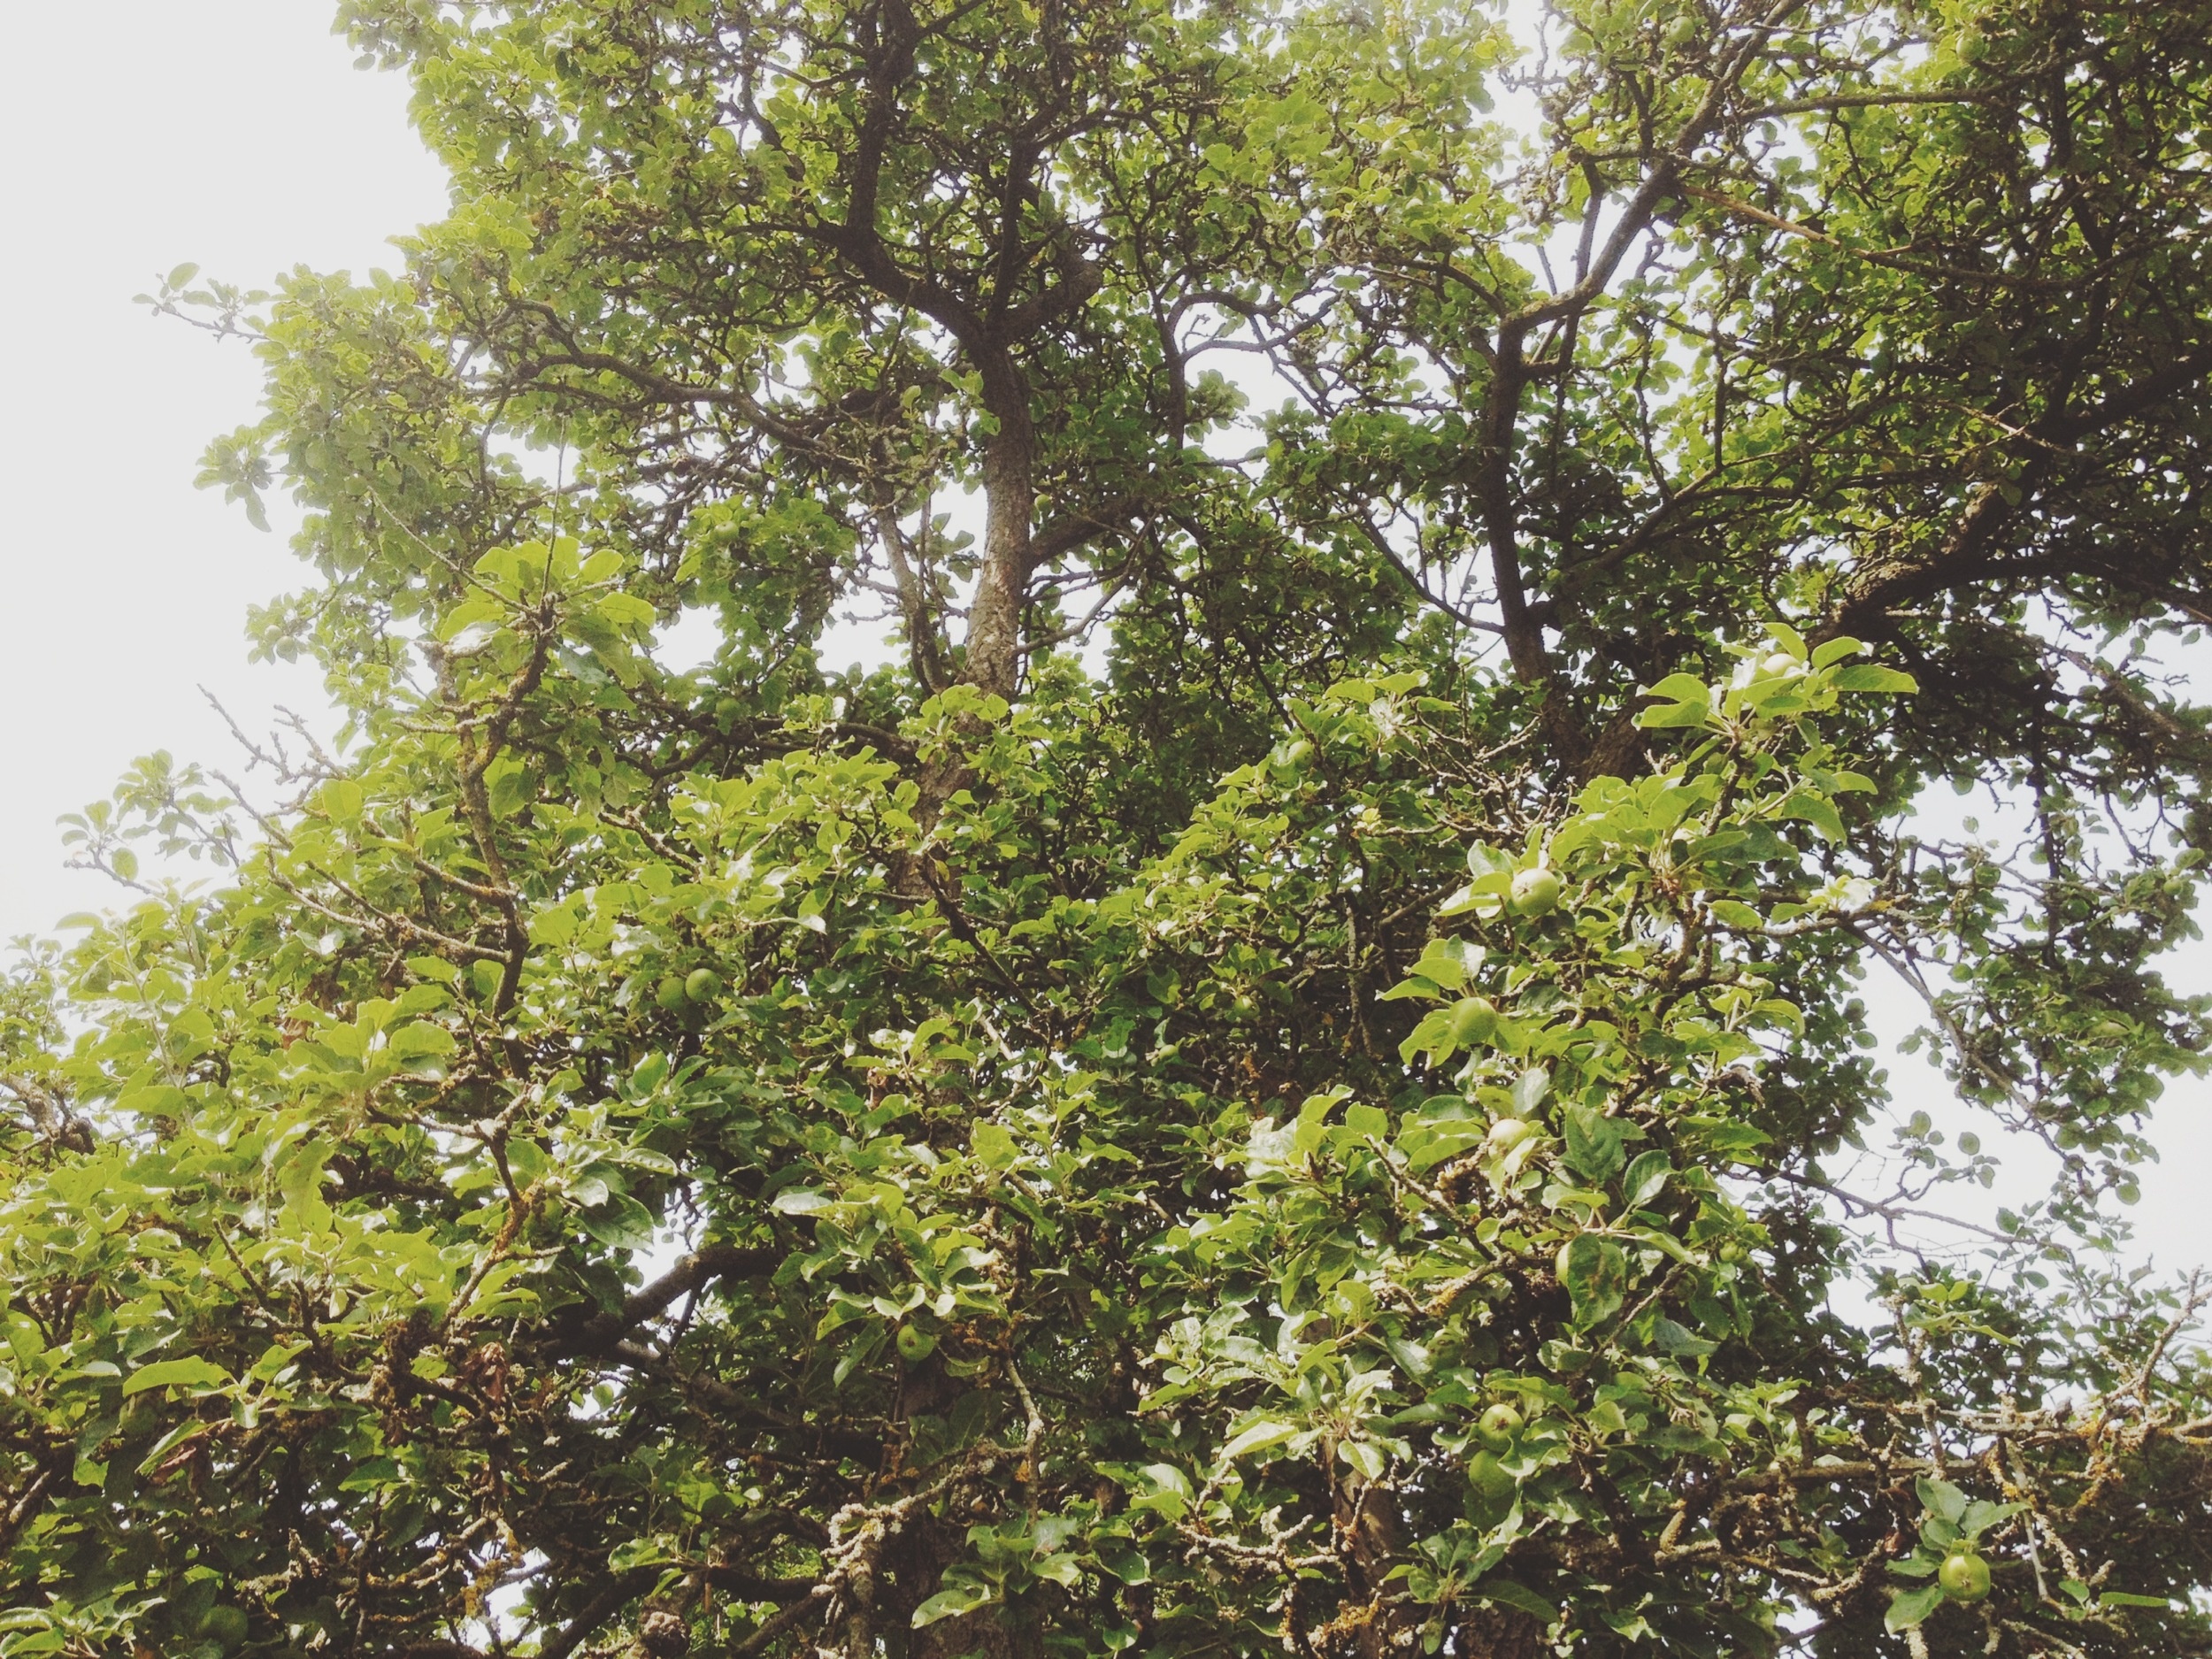 Yup, plenty of apples growing here